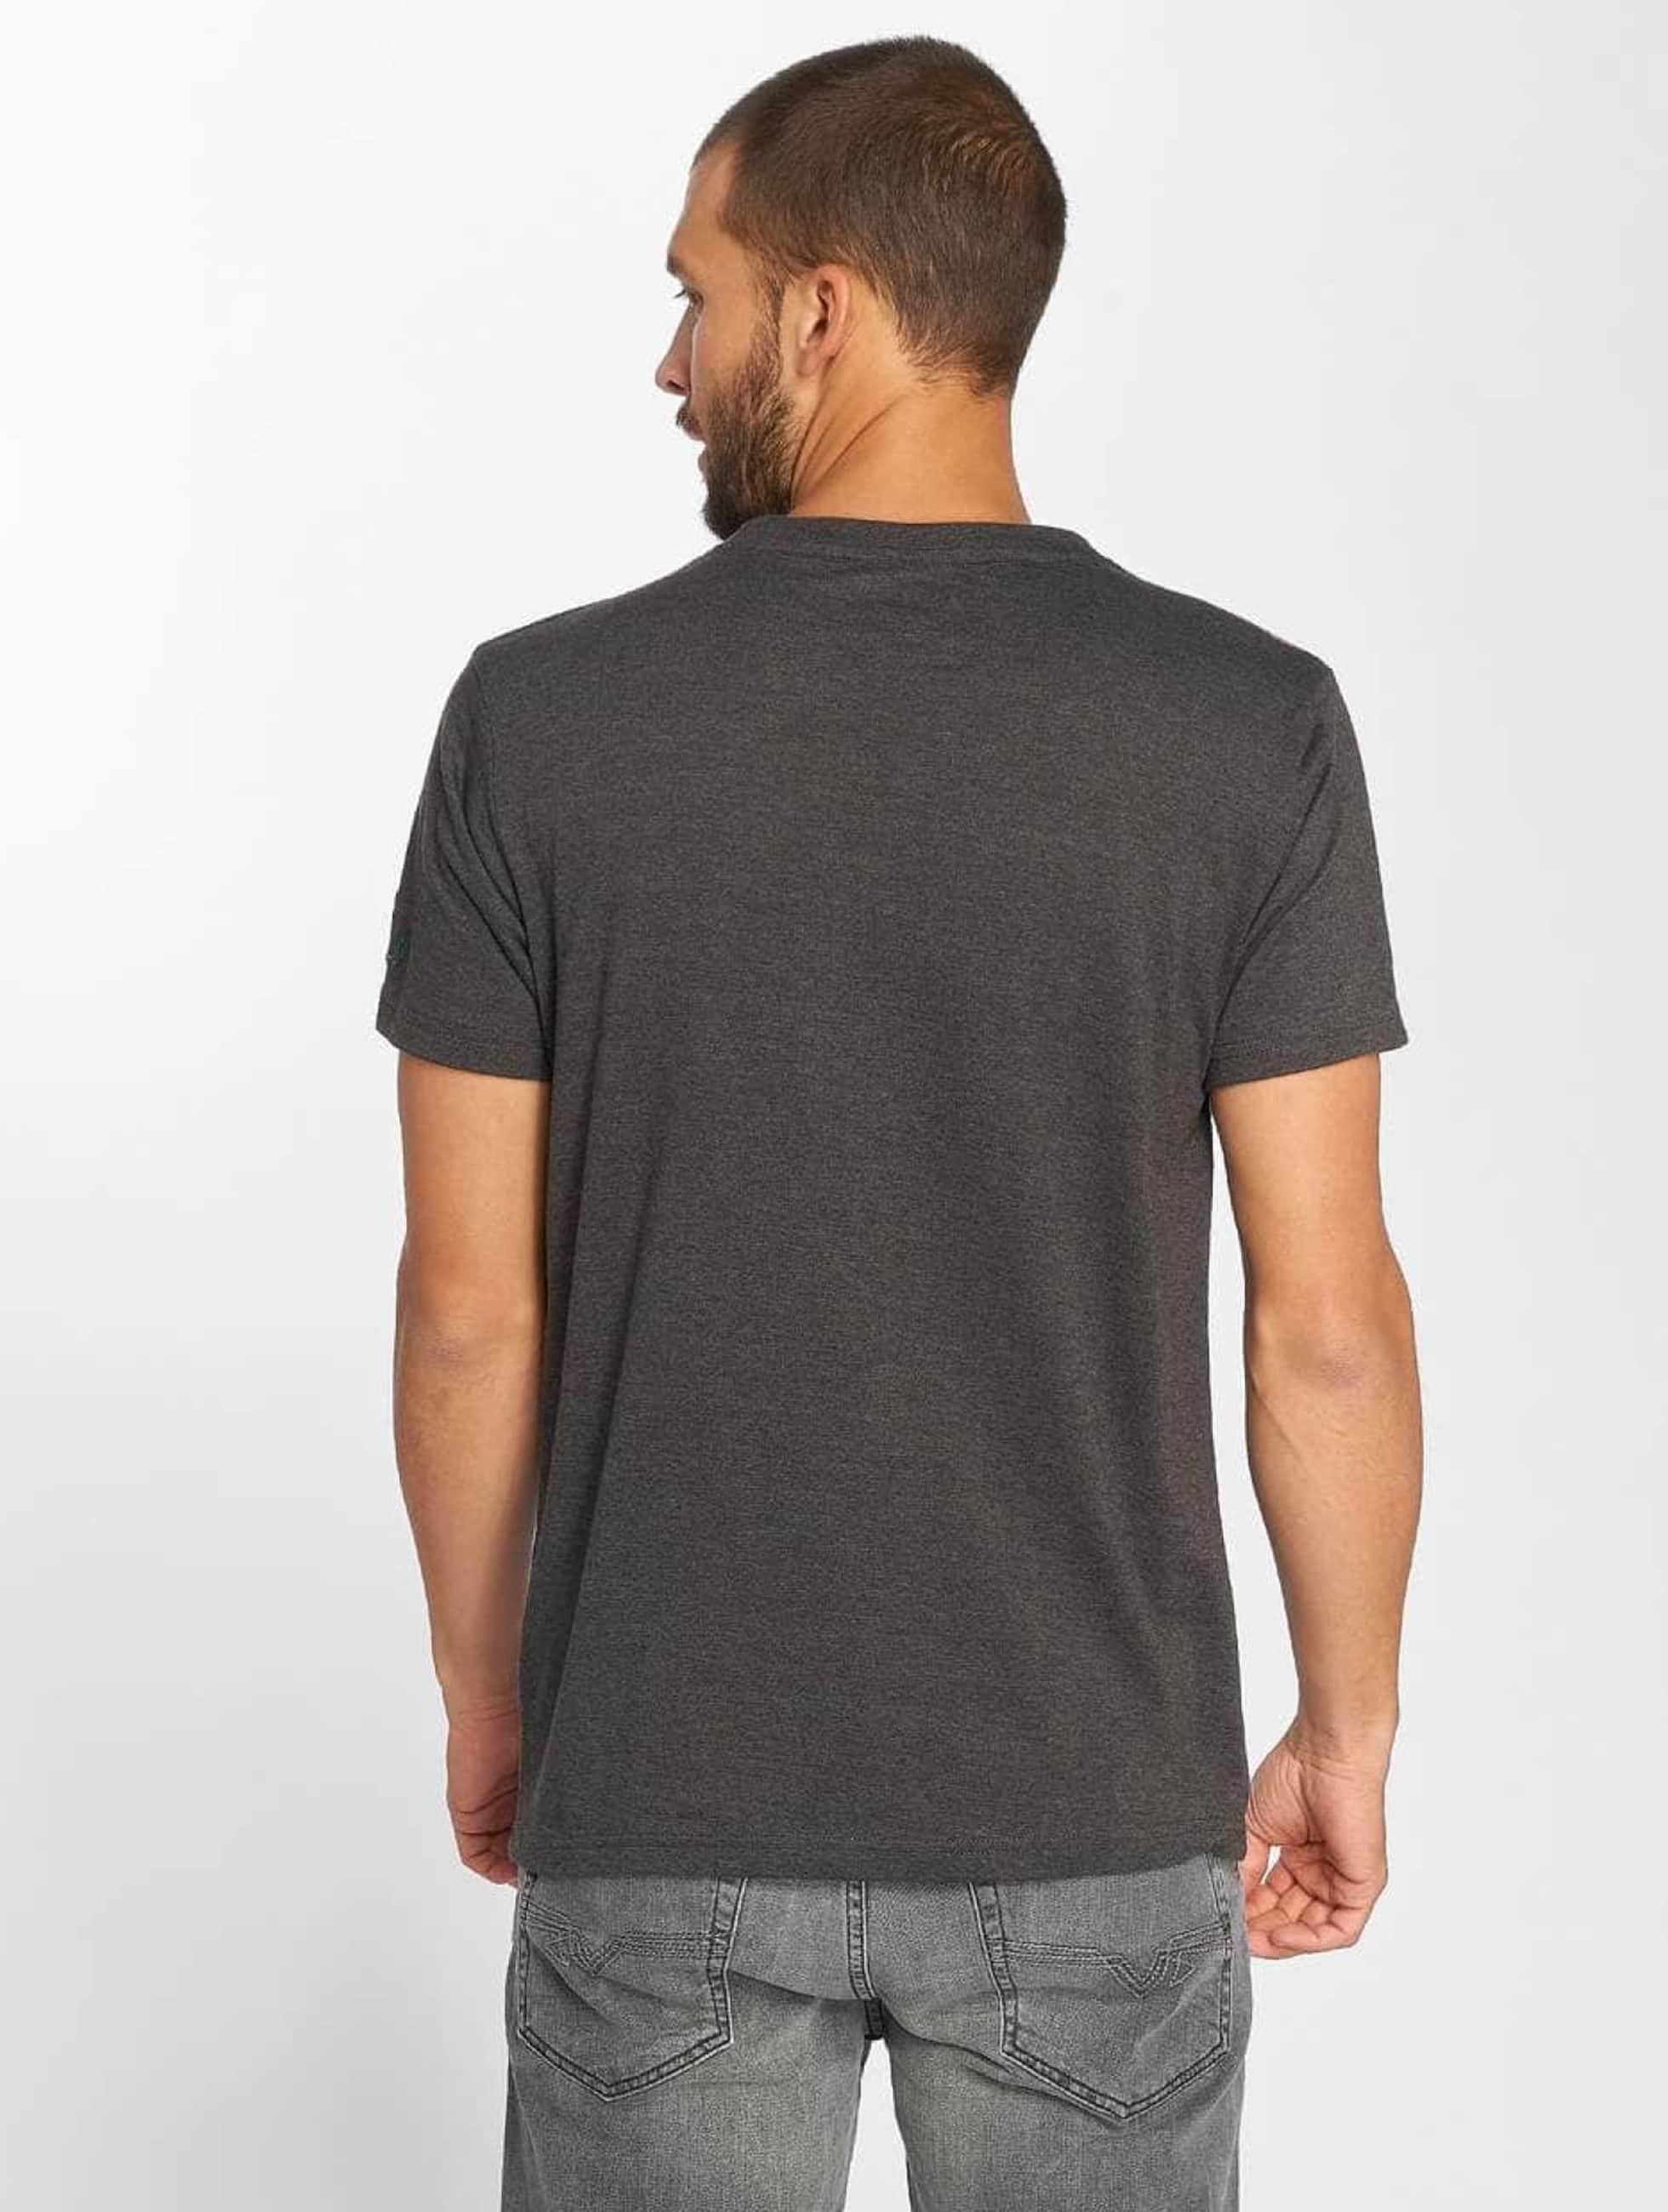 Just Rhyse / T-Shirt Islilla in black XL